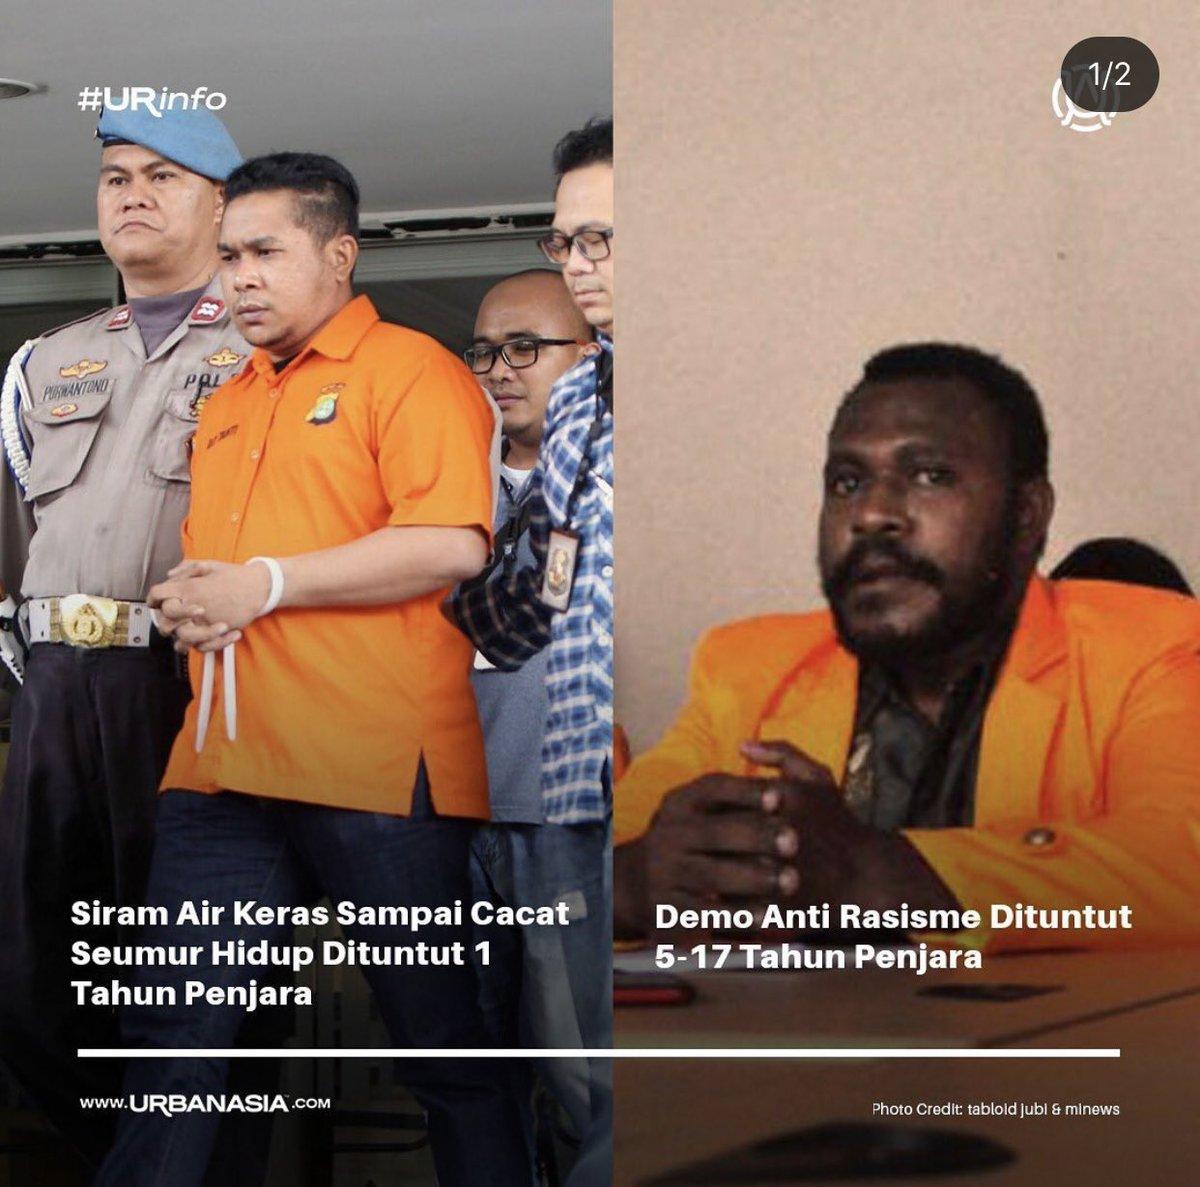 Keadilan sosial bagi seluruh rakyat Indonesia??? https://t.co/HI7p6f5CZ2